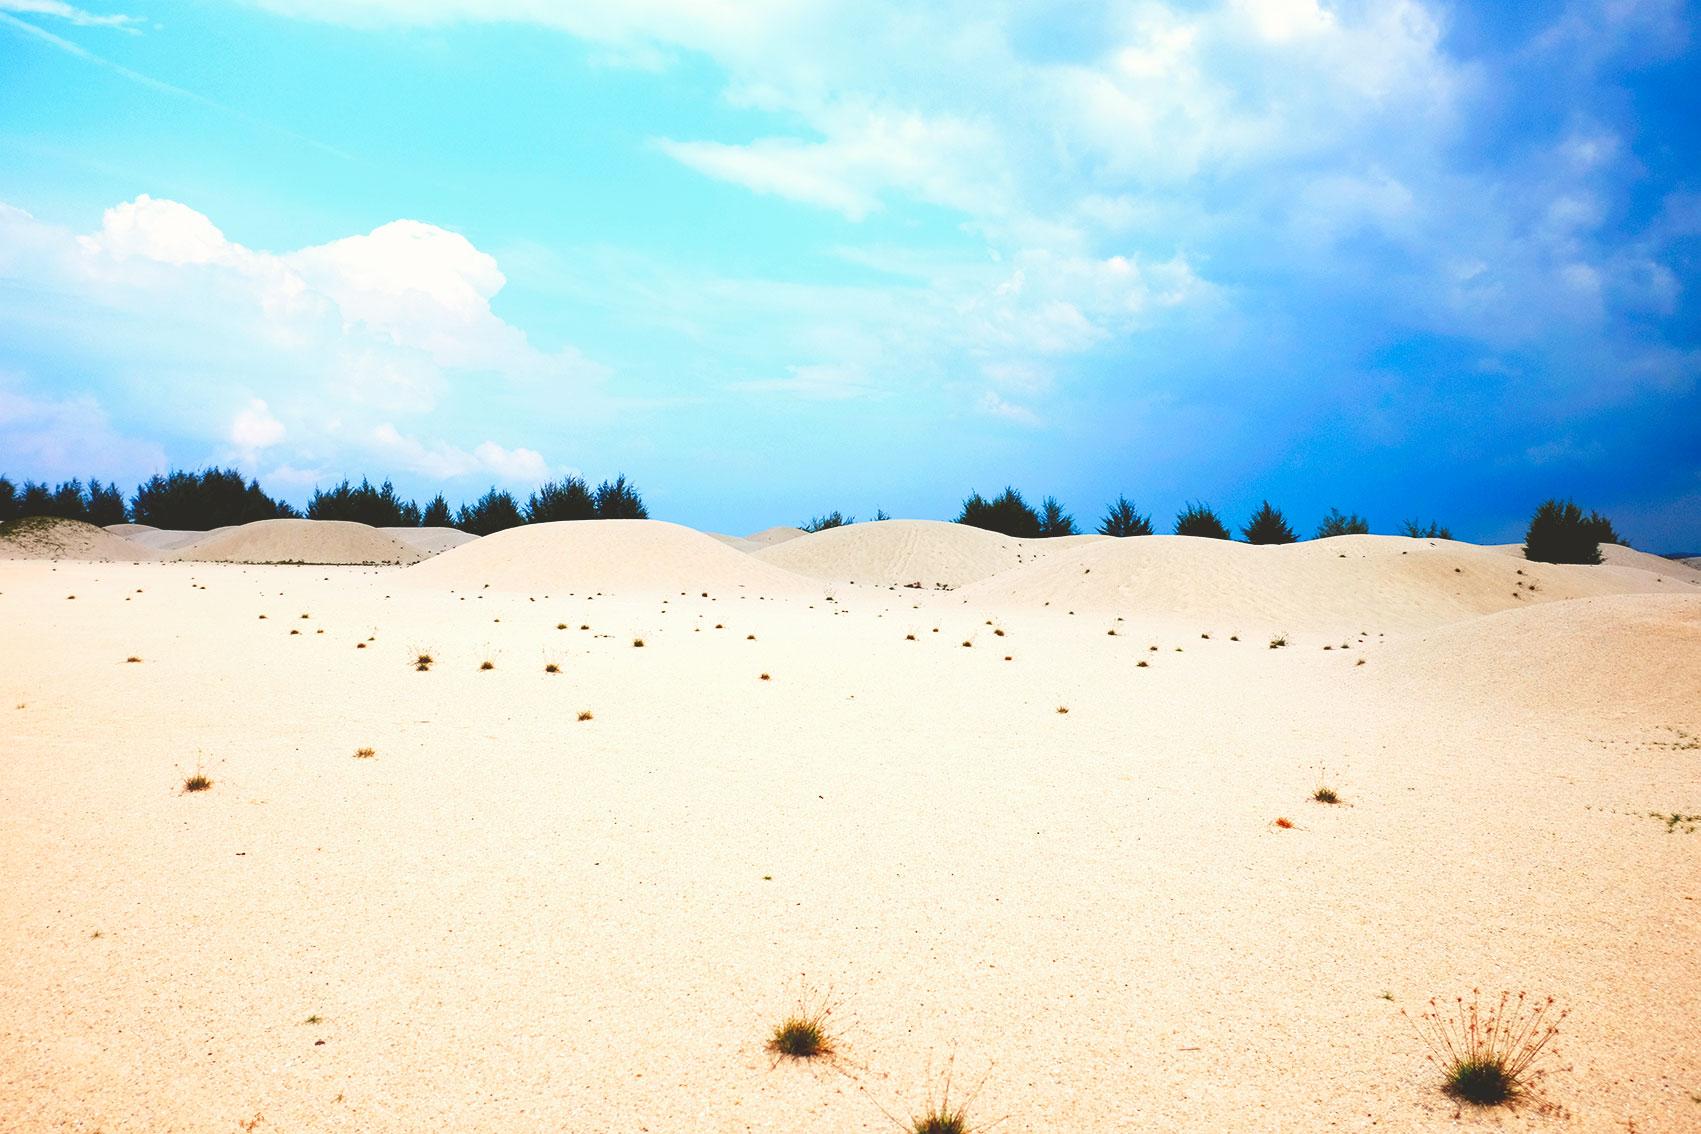 Malacca Desert